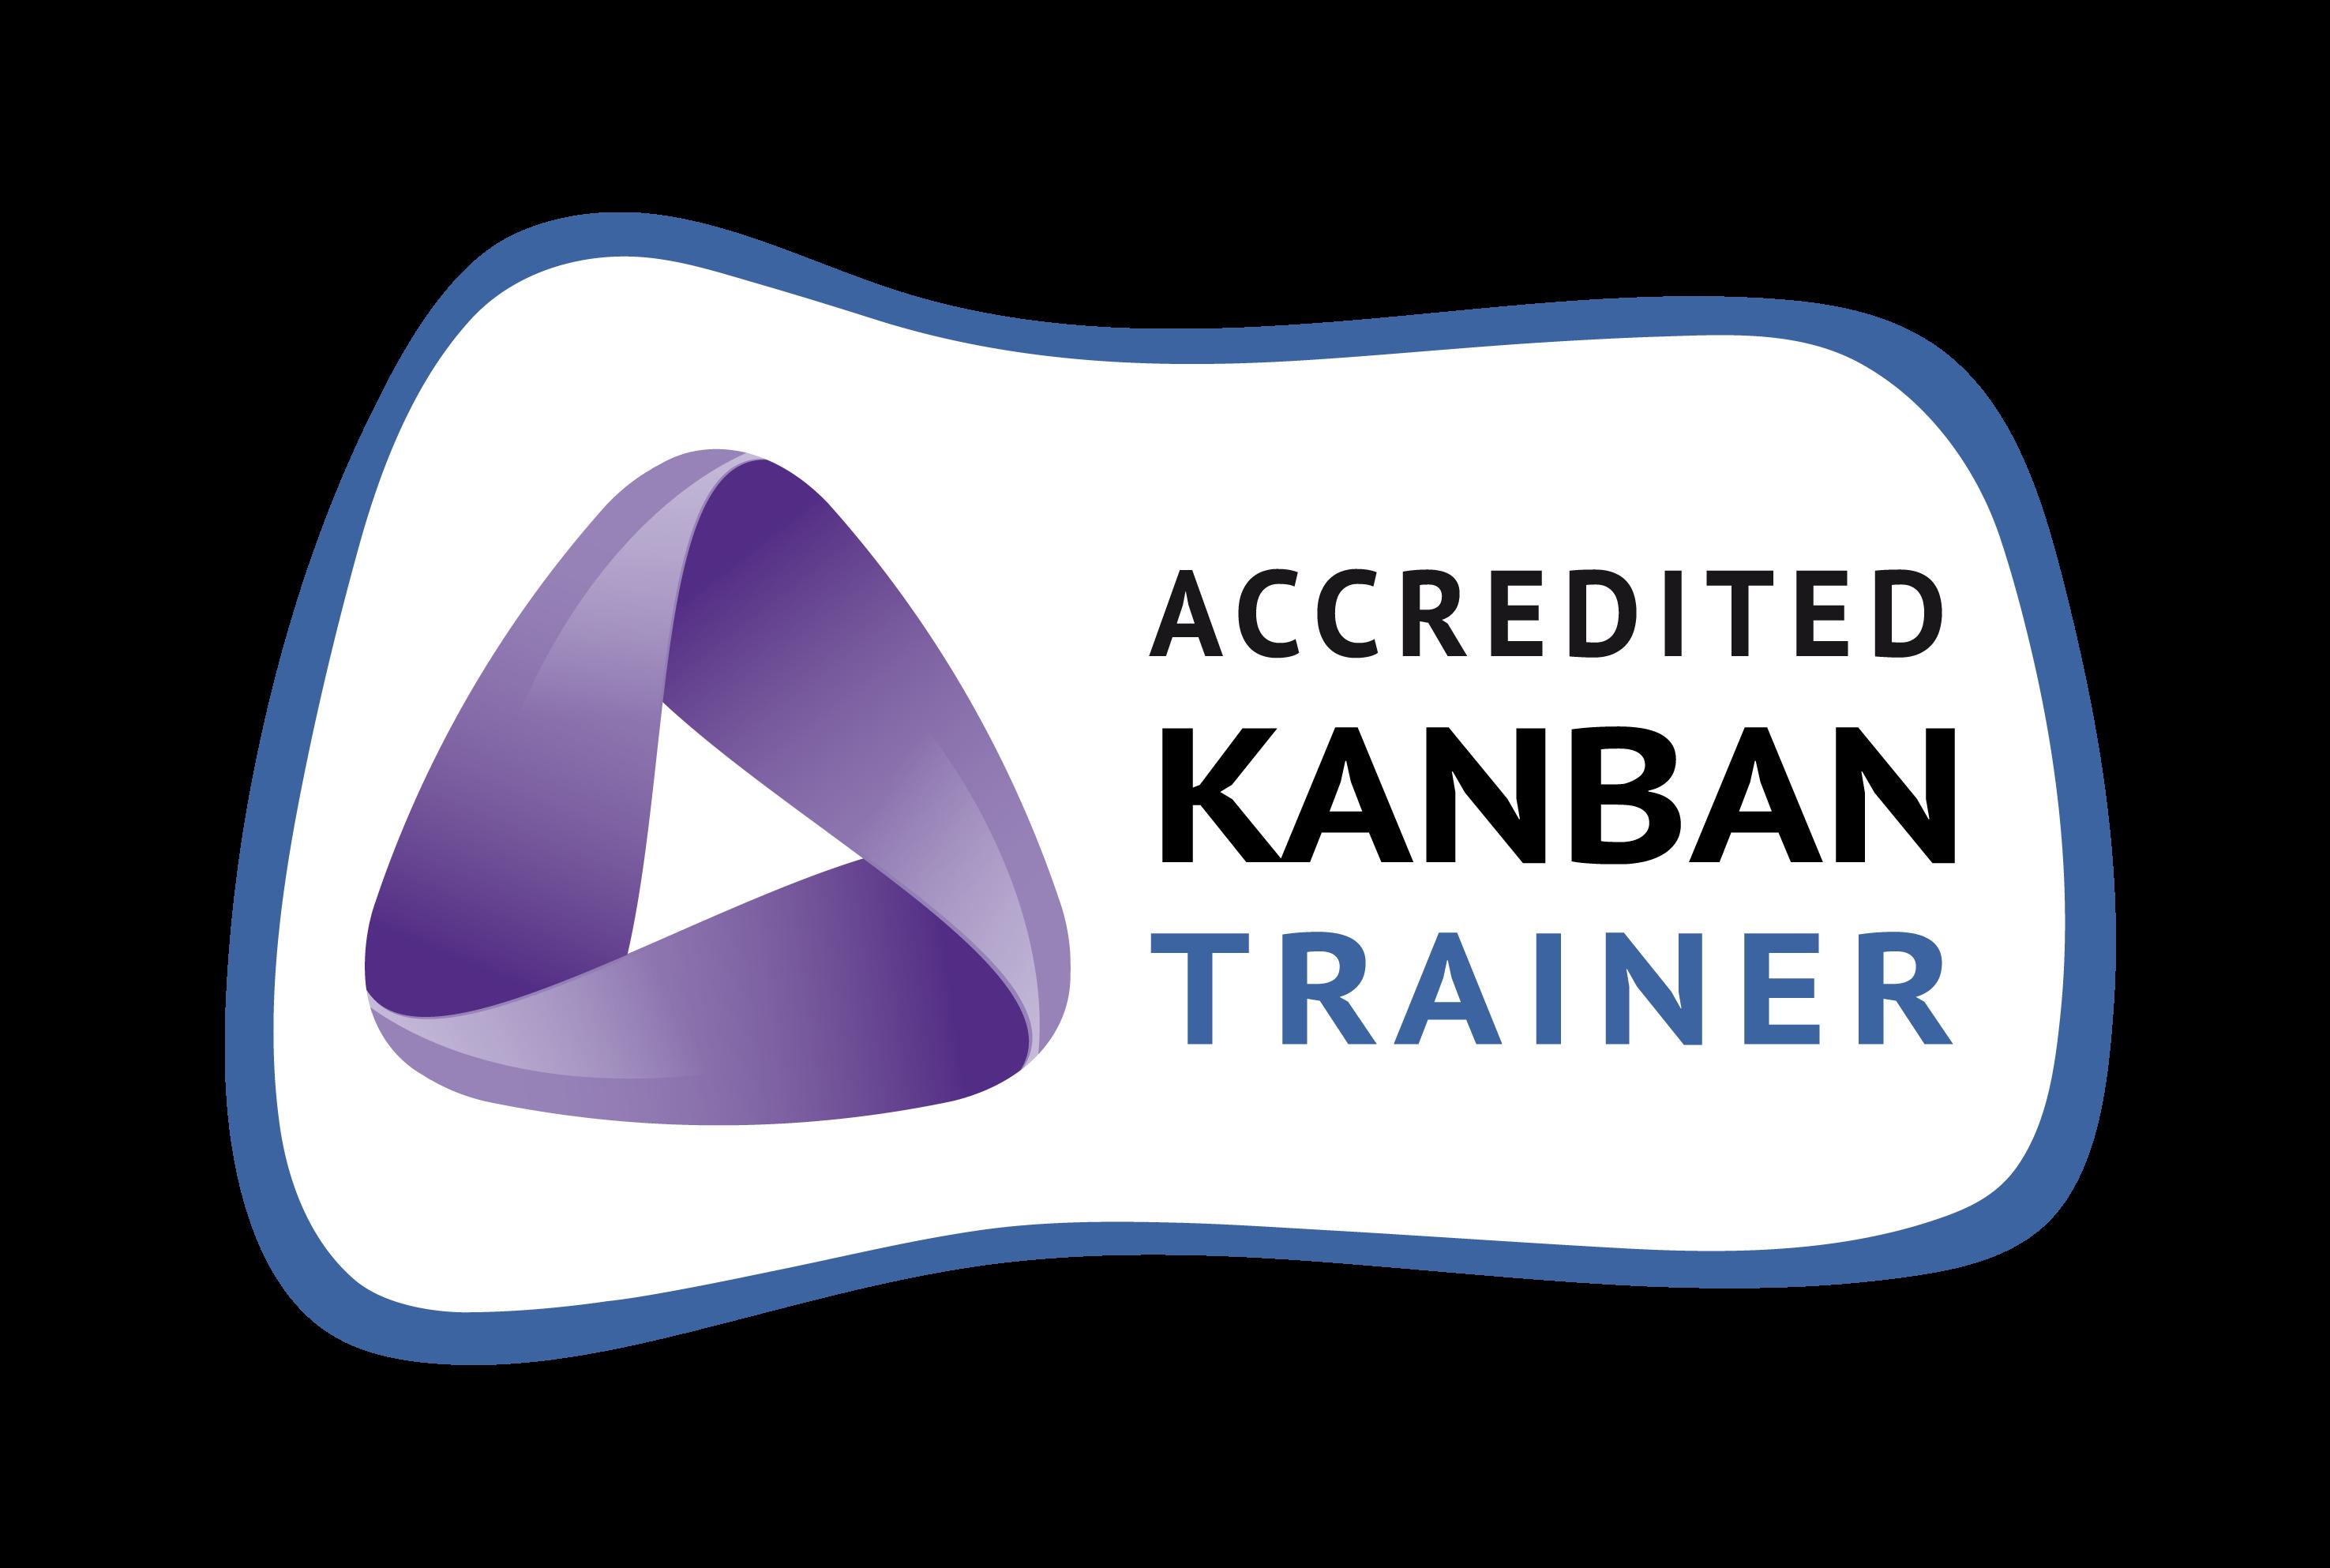 distintivo Accredited Kanban Trainer